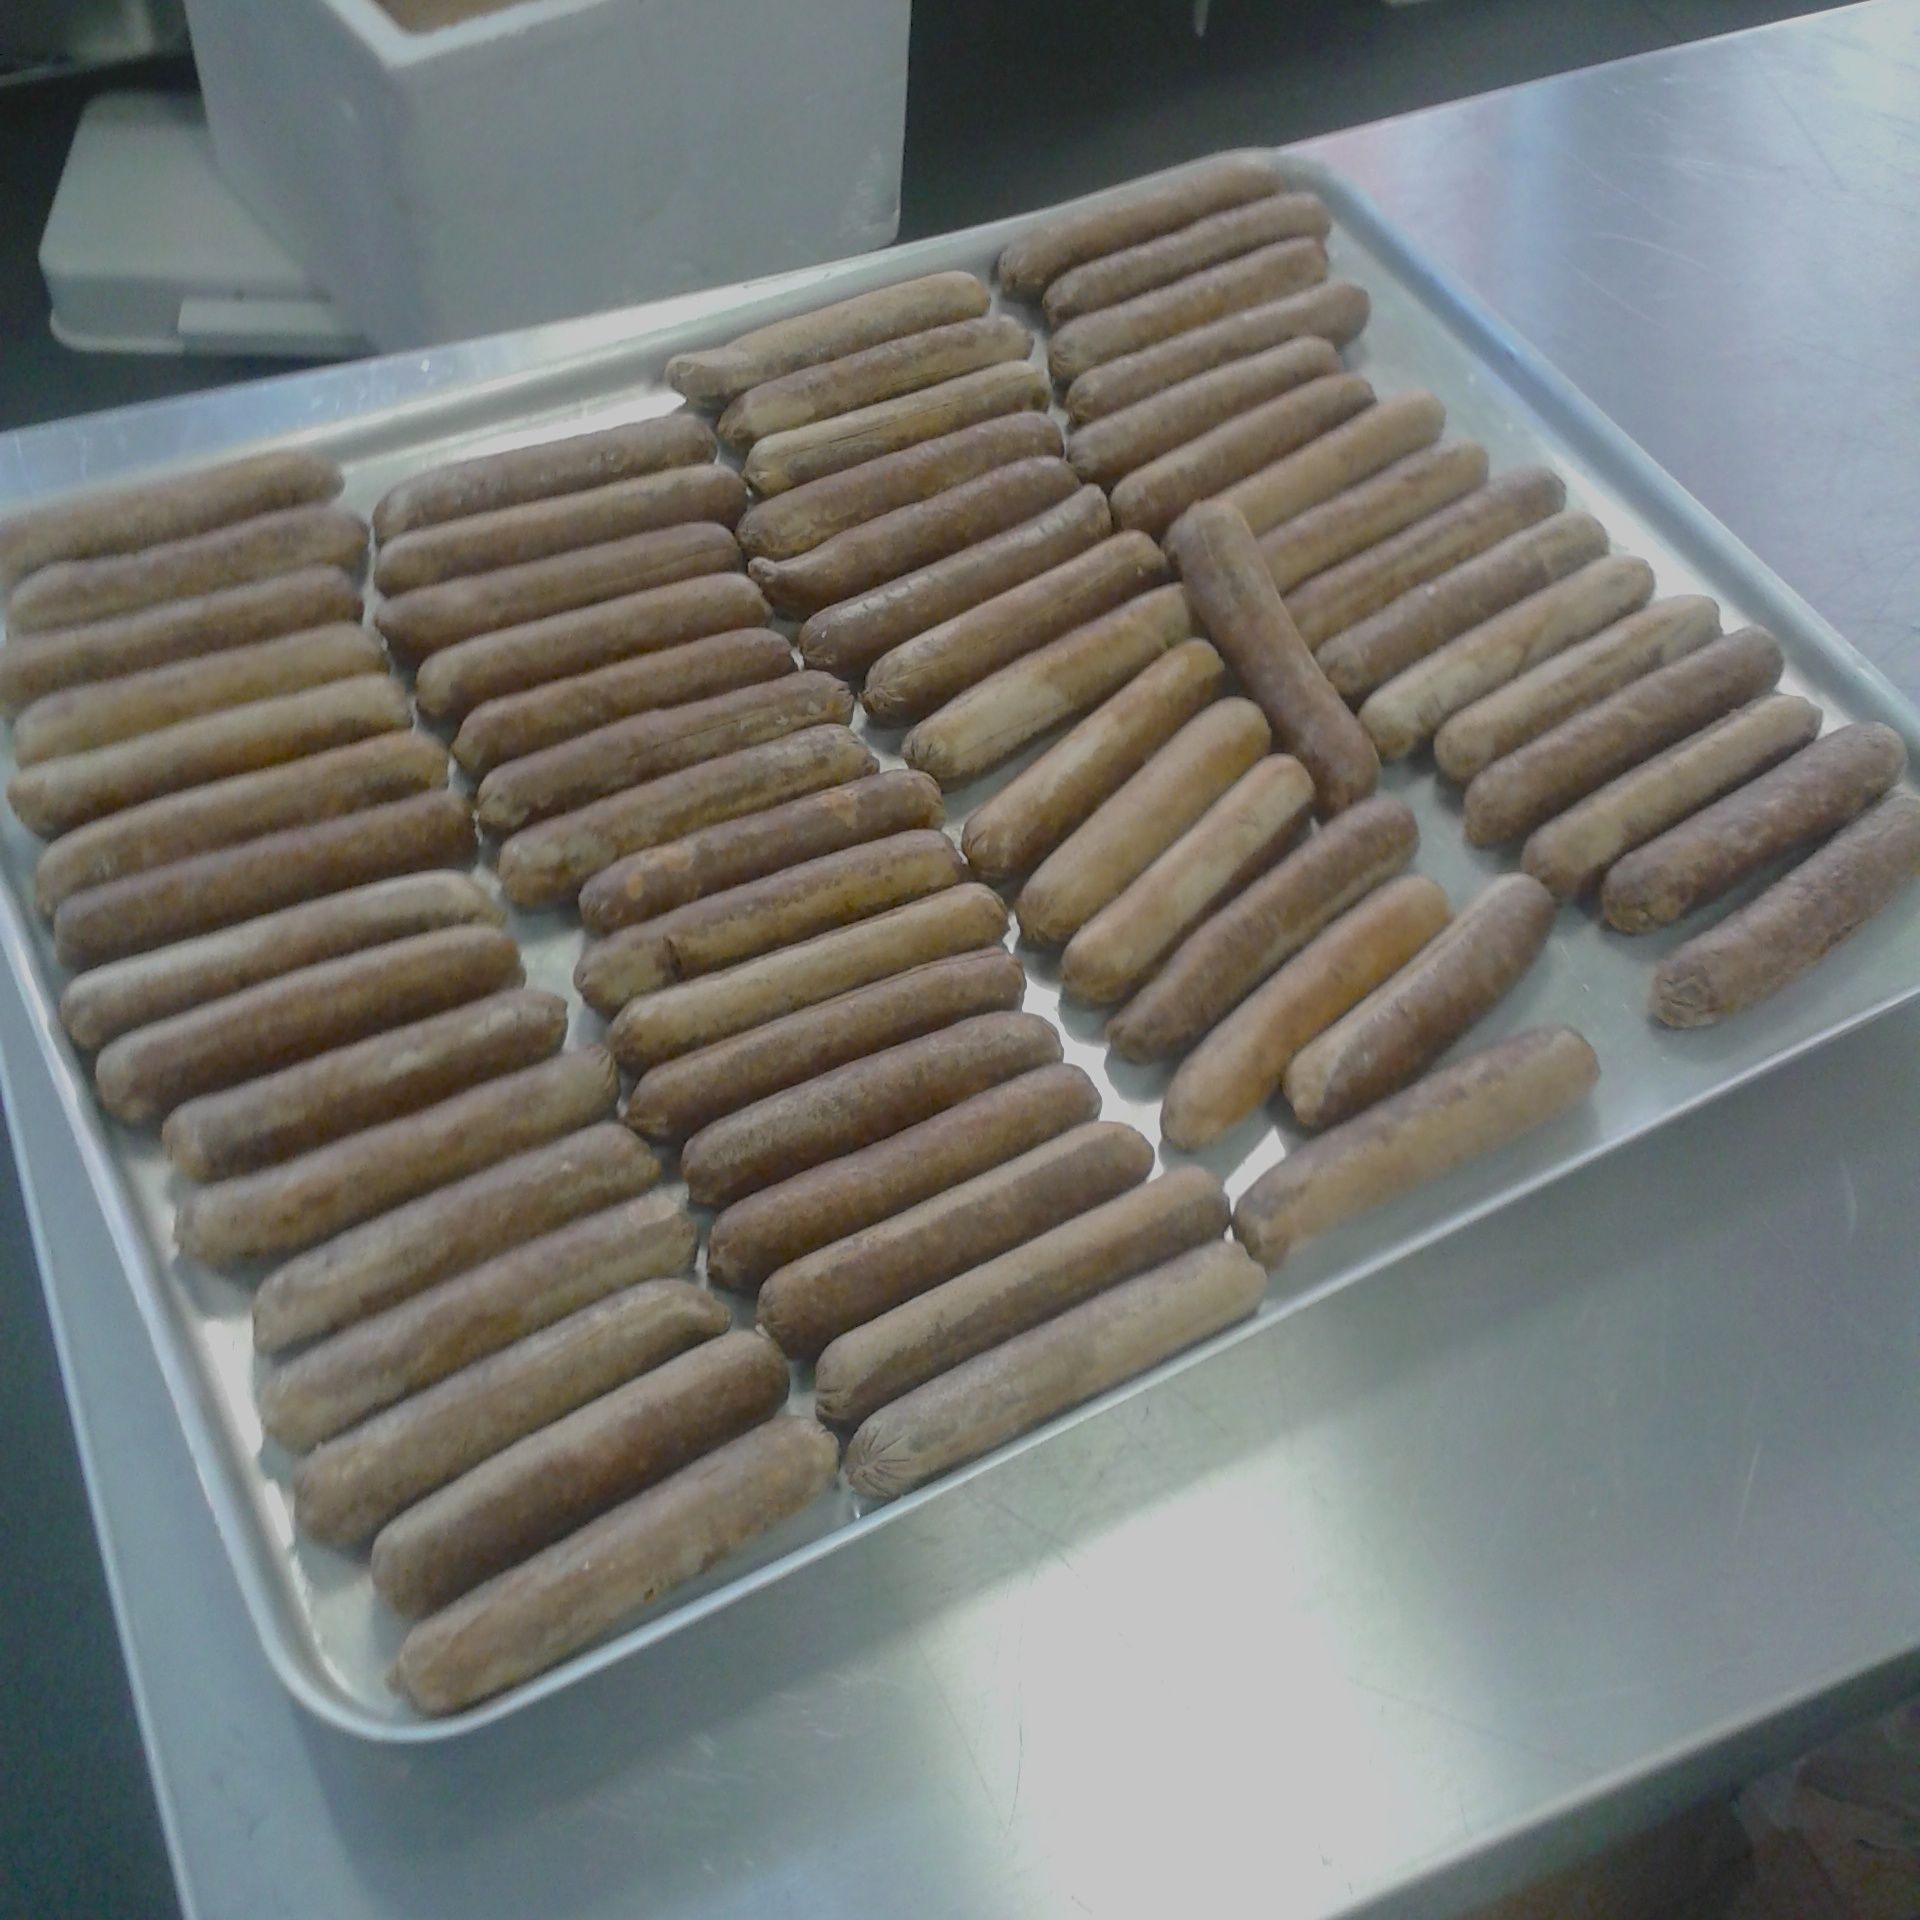 https://i0.wp.com/fatgayvegan.com/wp-content/uploads/2014/02/sausages.jpg?fit=1920%2C1920